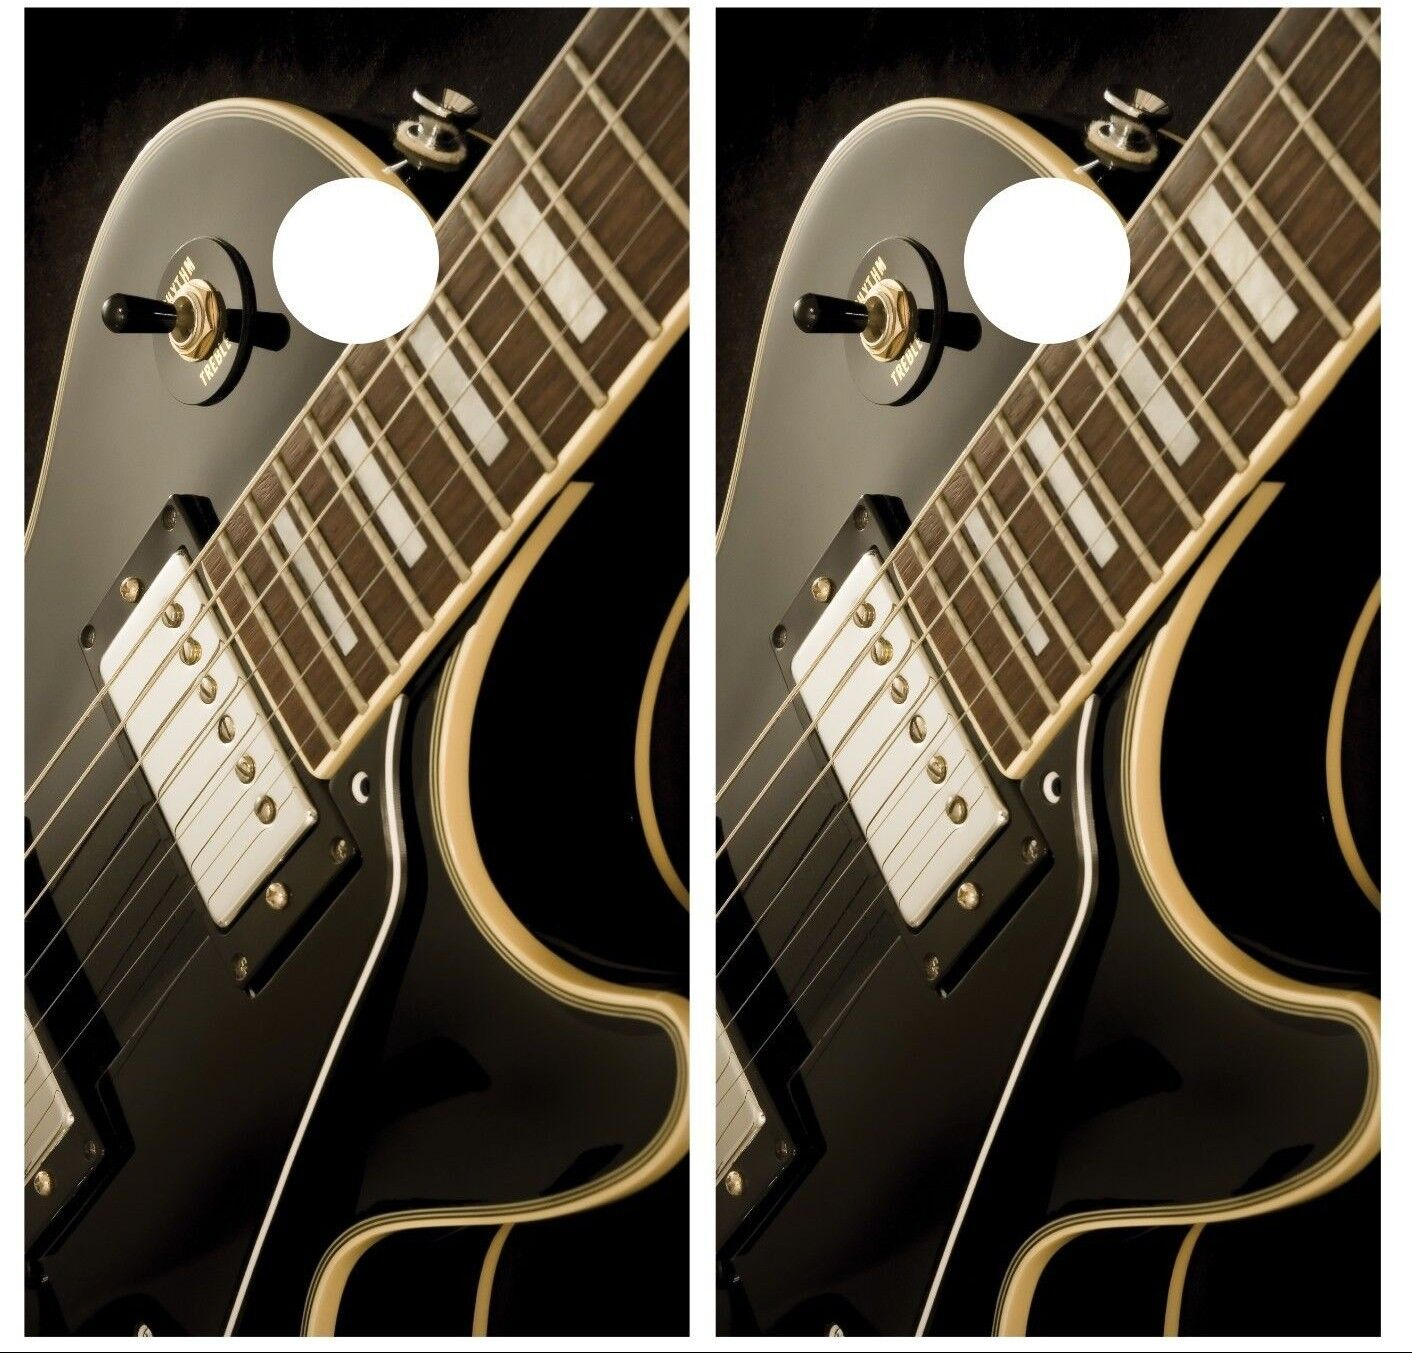 Electric Guitar Music Cornhole Board Decal Wrap Wraps